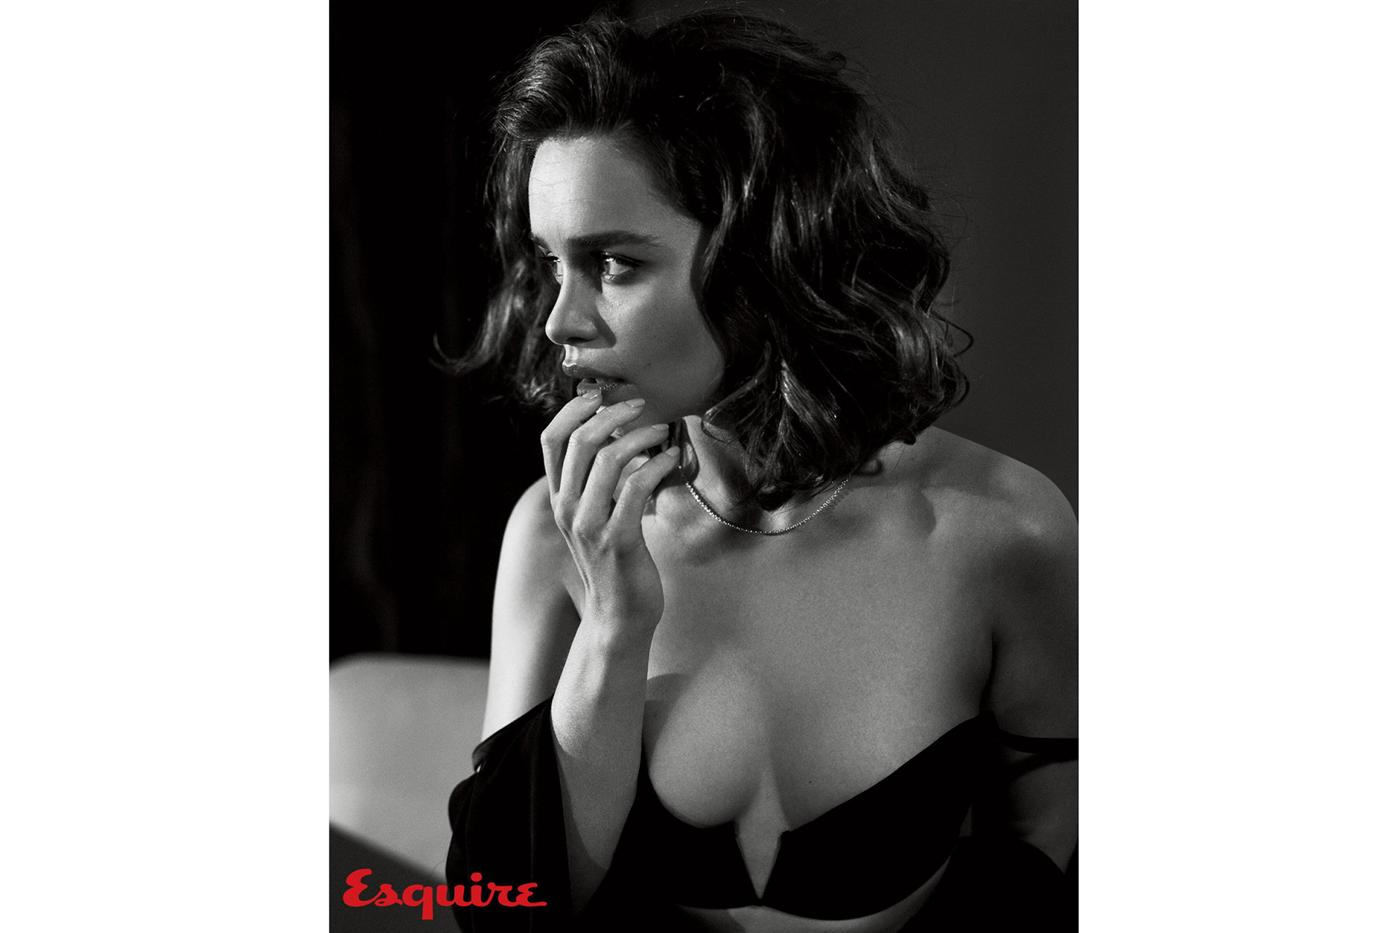 The Sexiest Woman Alive: Emilia Clarke 6